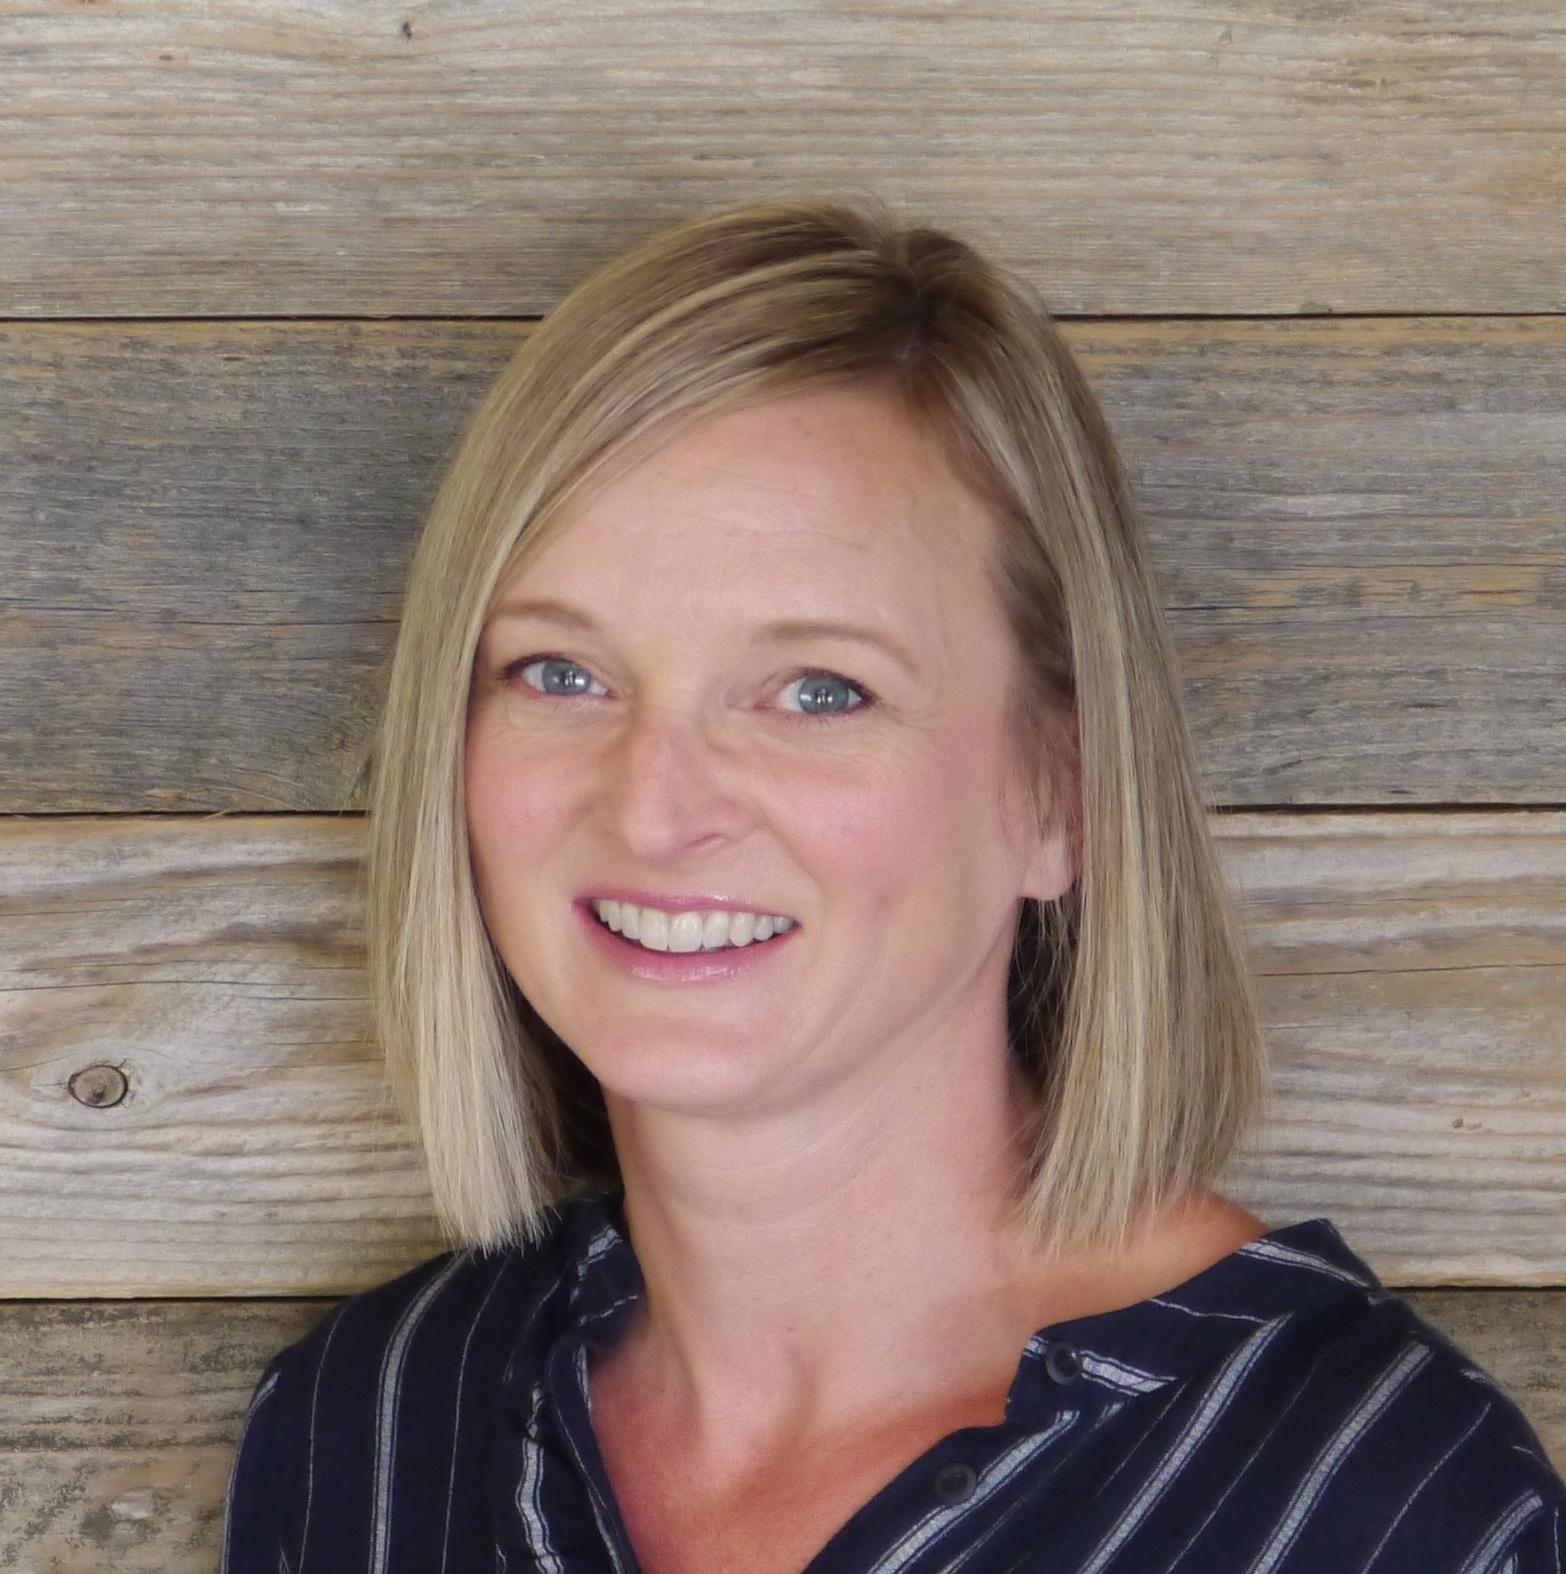 Becky Barsotti - Transaction Coordinator 206-714-7622 becky@TheSakiGroup.com